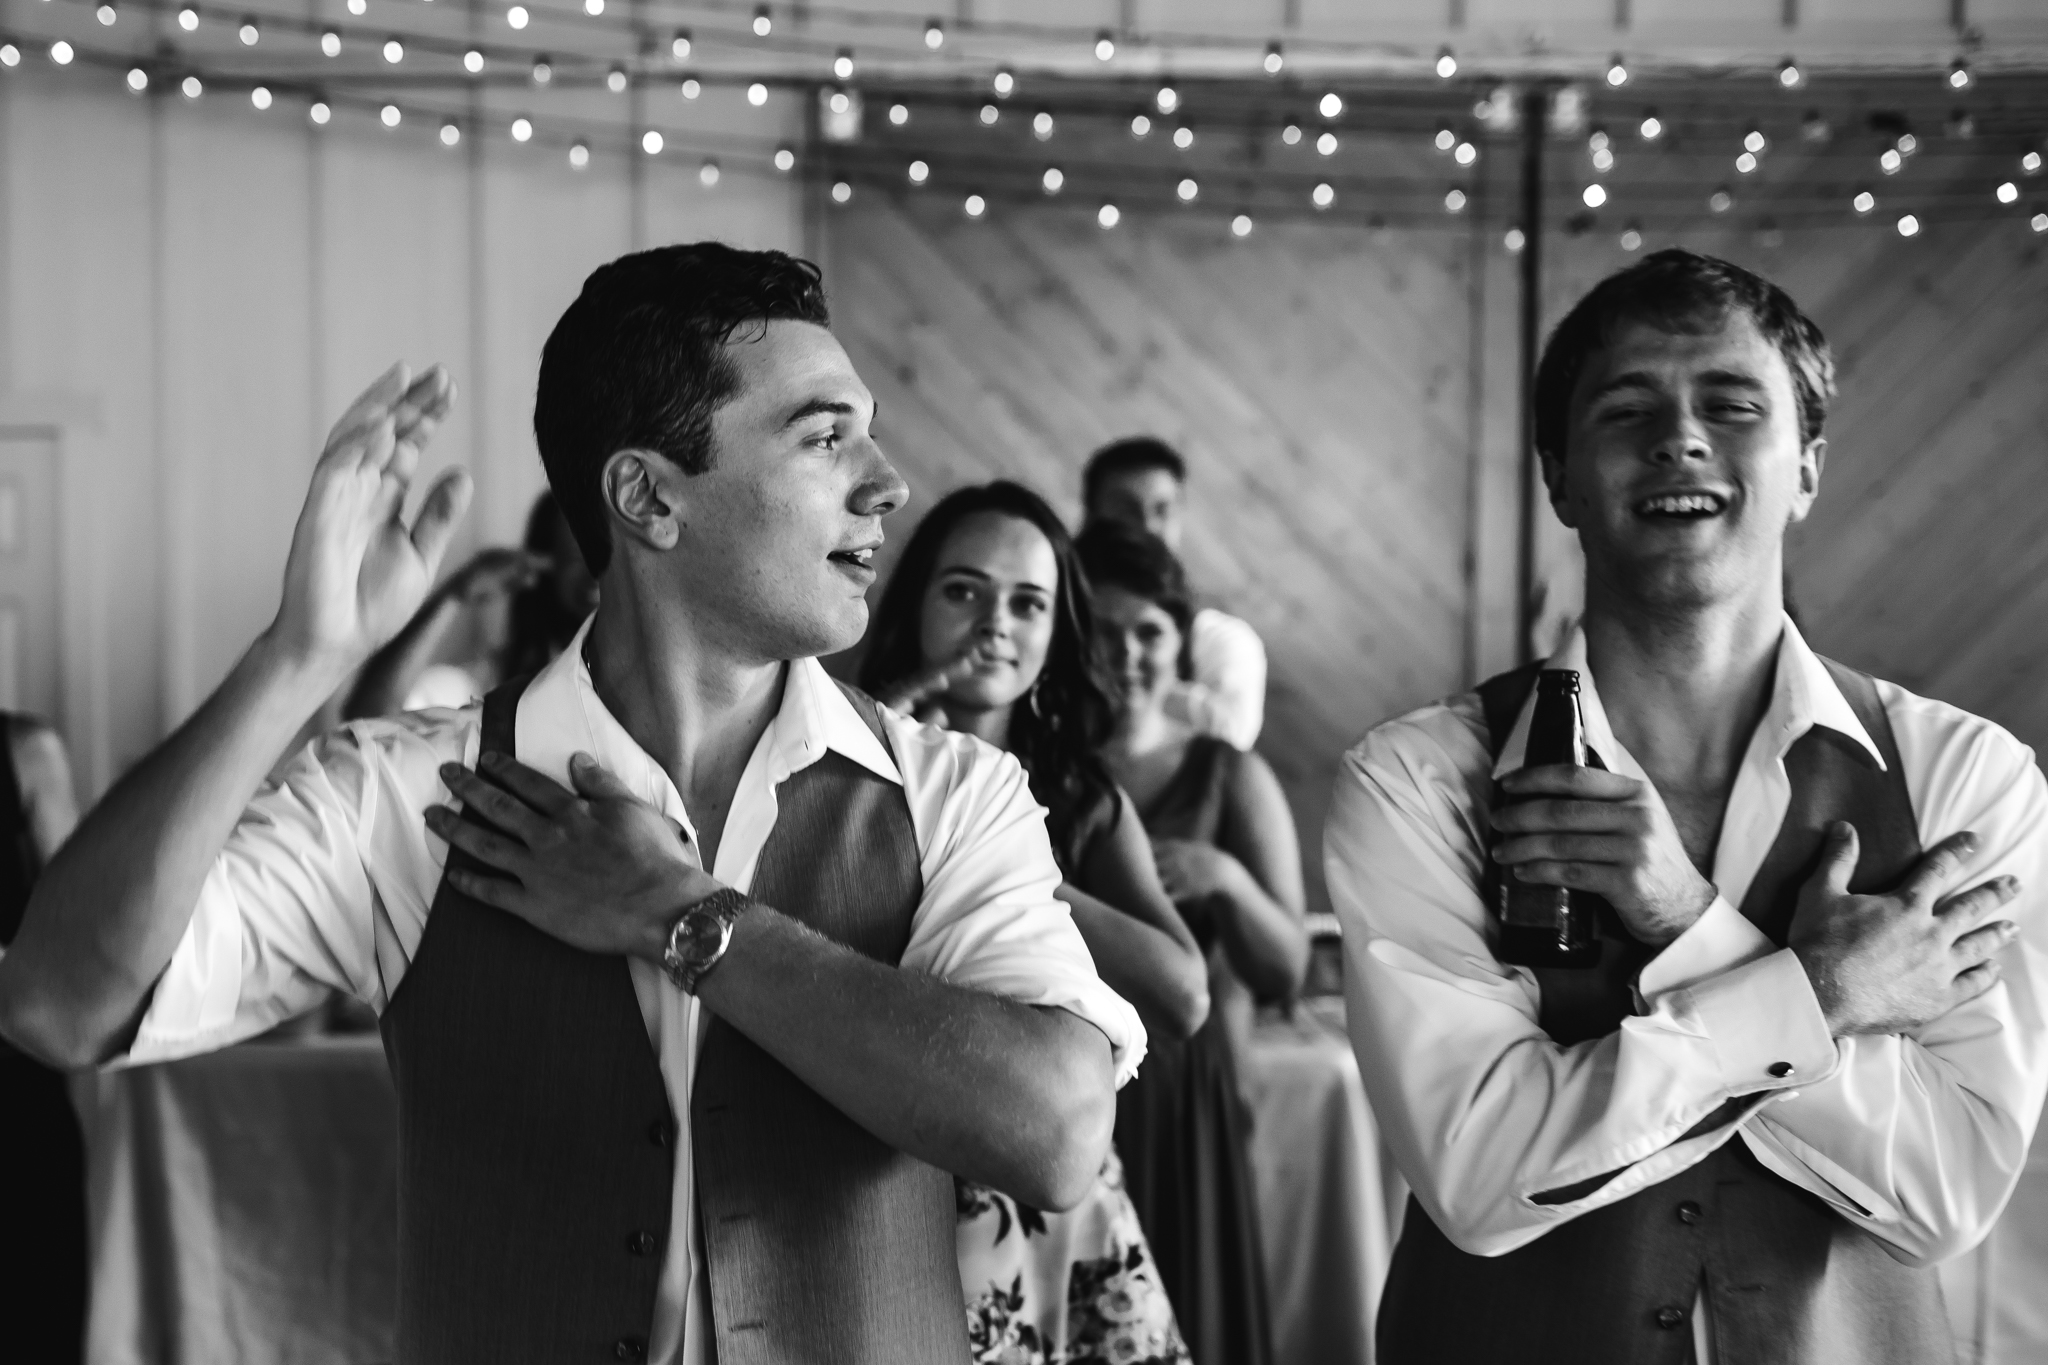 asheville-wedding-photographers-TheBasilicaofSt.Lawrence-IvyCreekFamilyFarm-thewarmtharoundyou (37 of 52).jpg